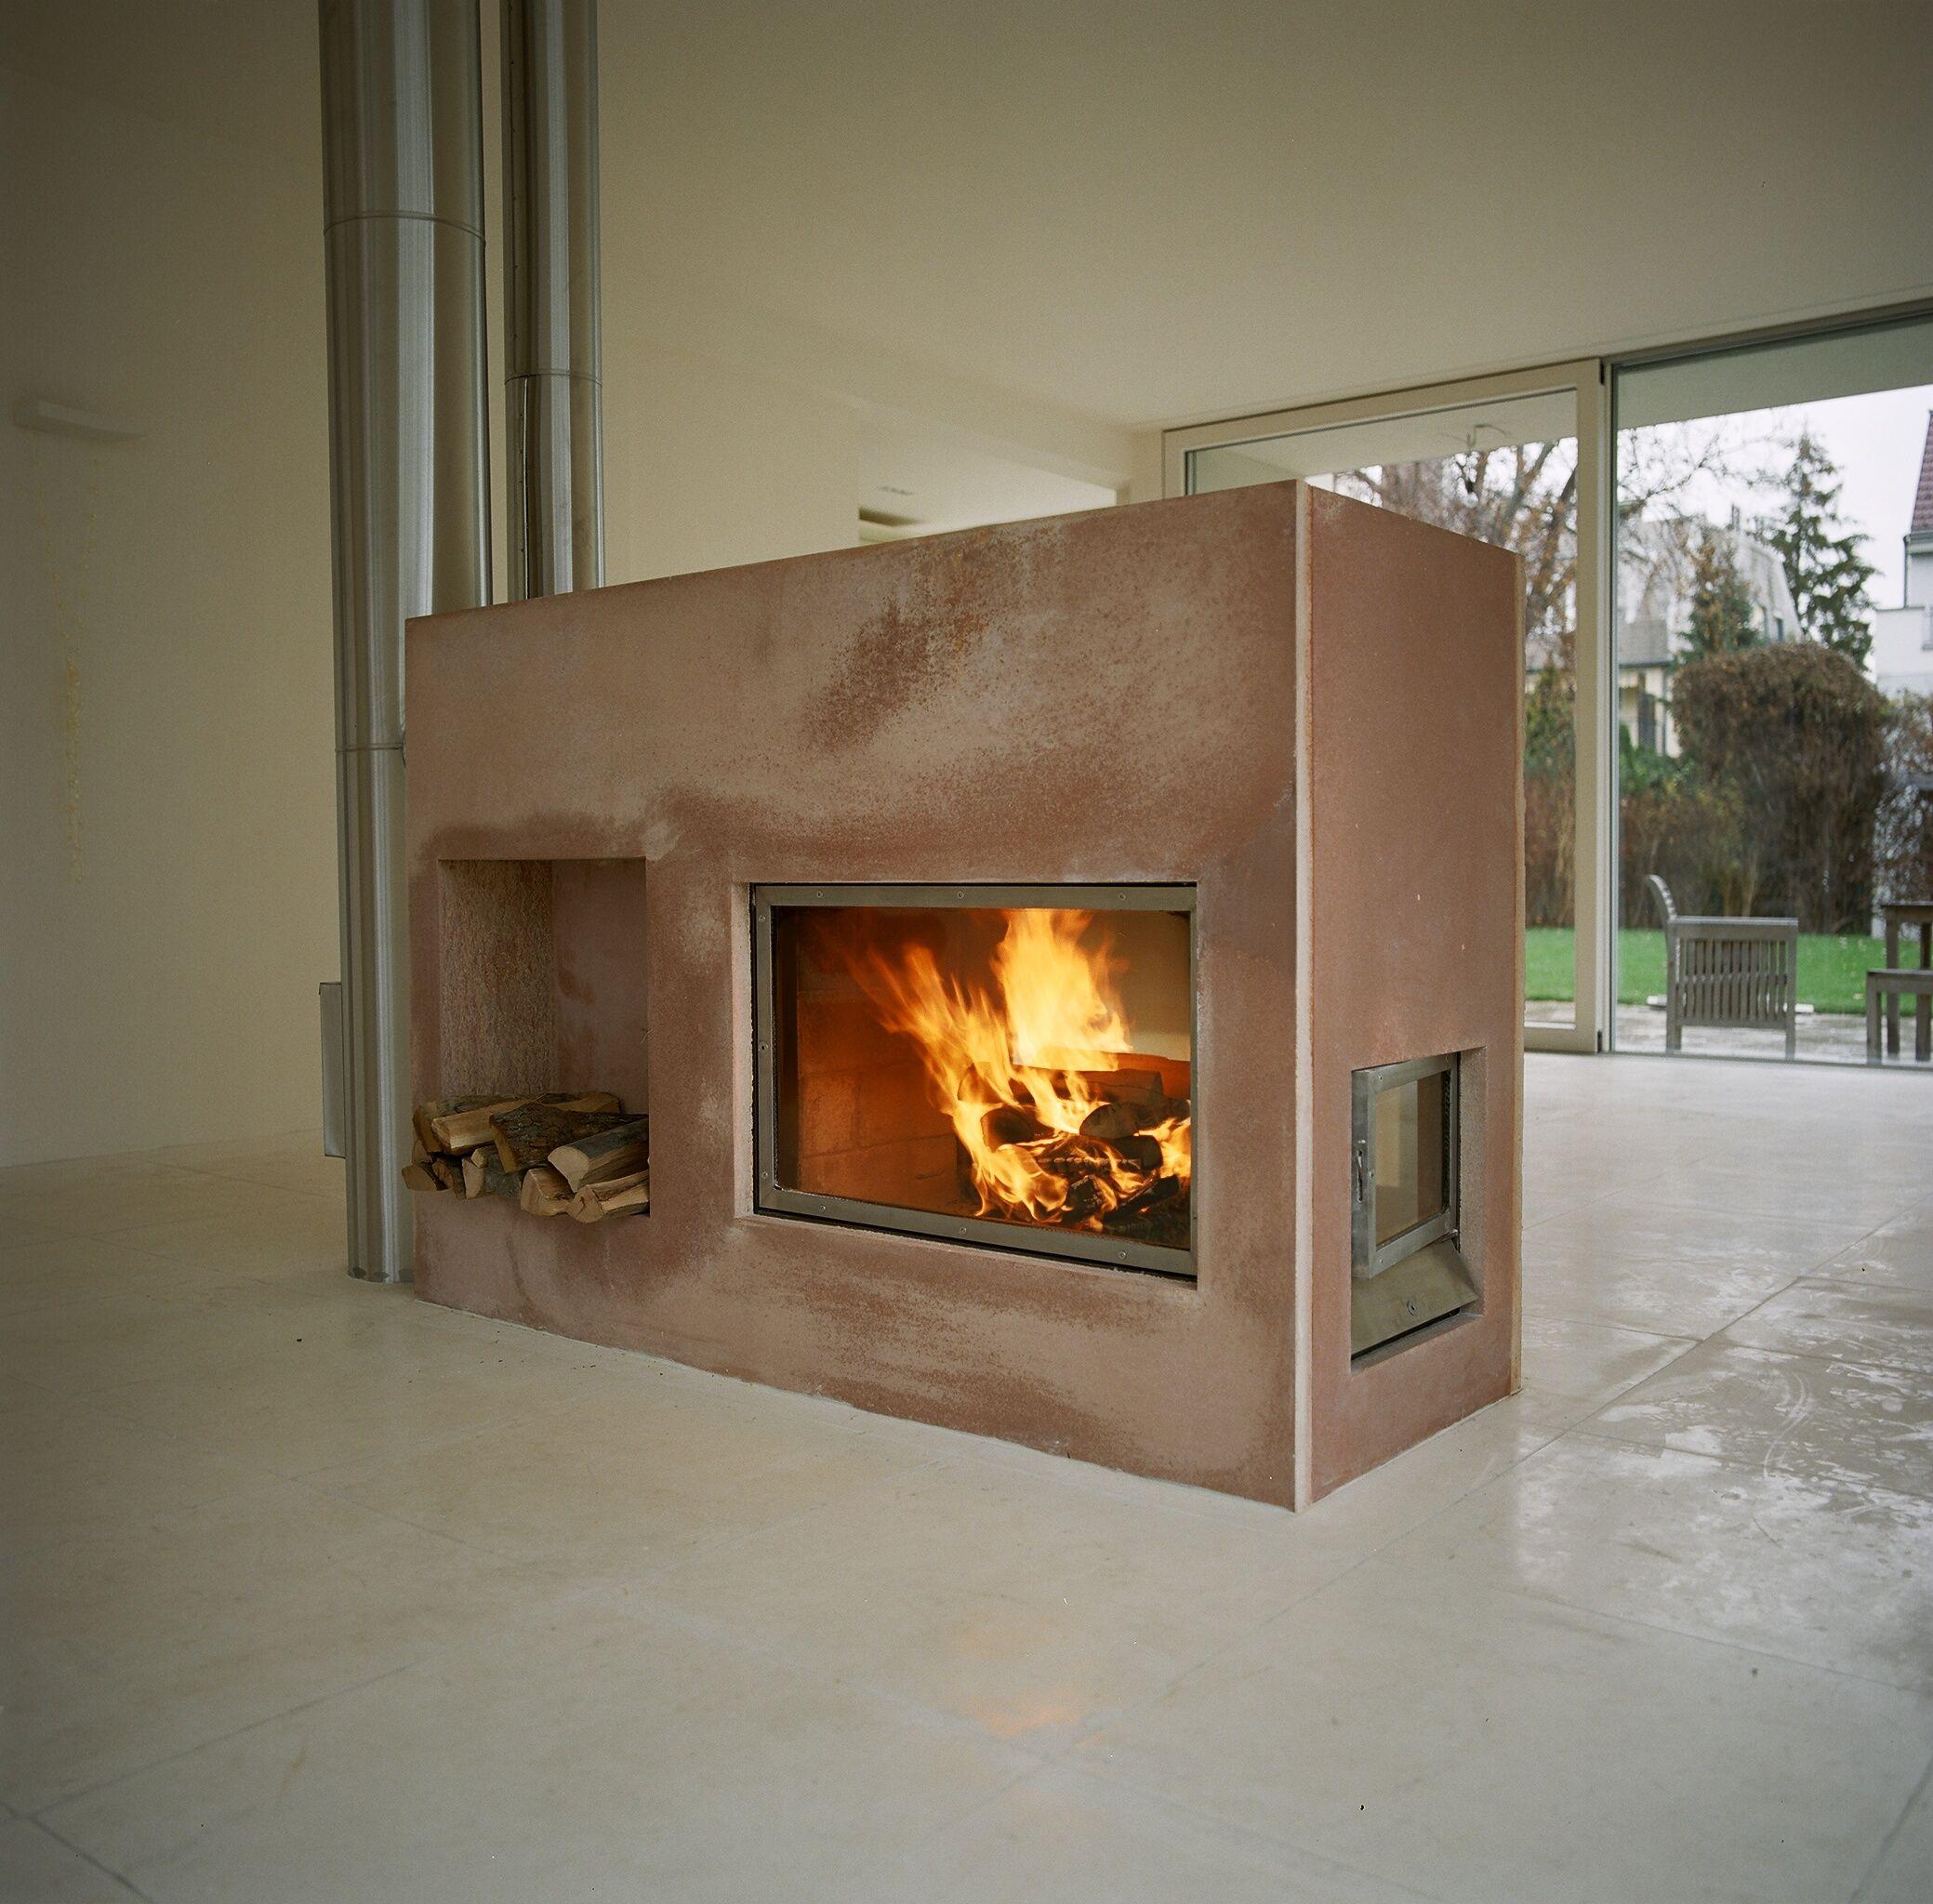 mayerofen wien kachelofen kamin kaminofen ofen kachelofen pinterest kachelofen. Black Bedroom Furniture Sets. Home Design Ideas